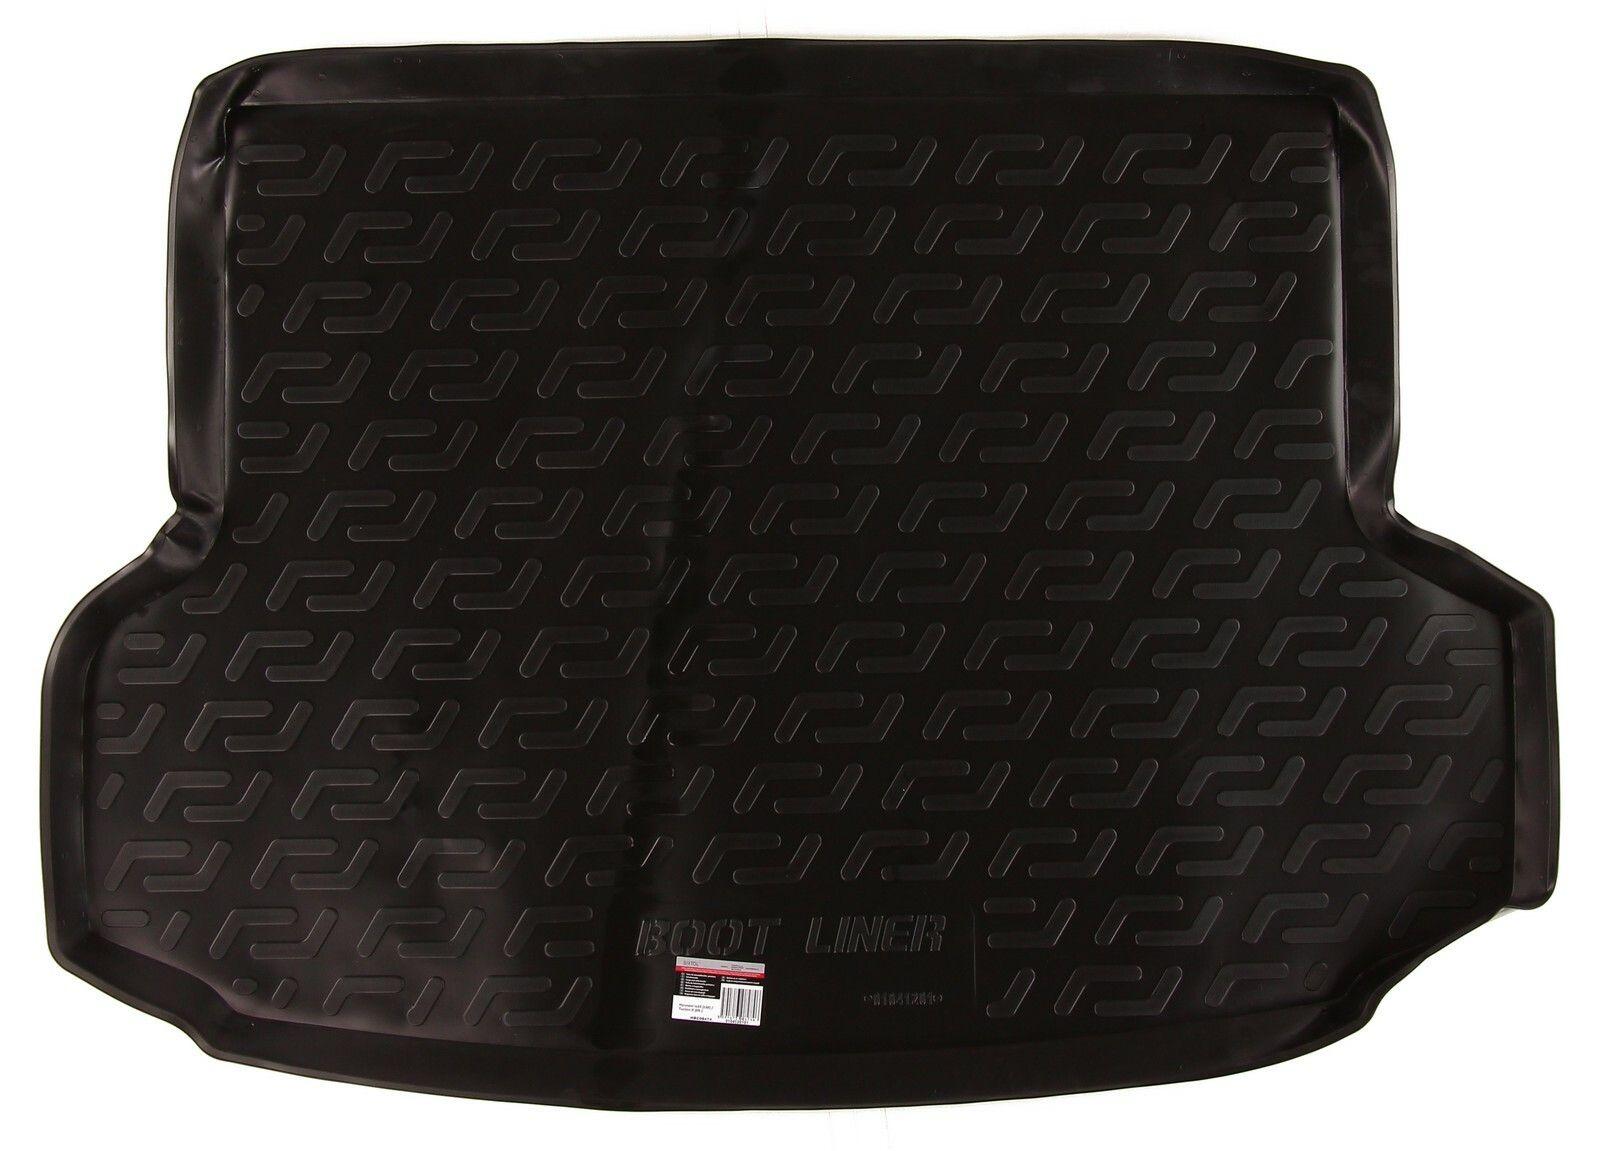 Vana do kufru gumová Hyundai ix35 (LM) / Tucson II (09-) SIXTOL